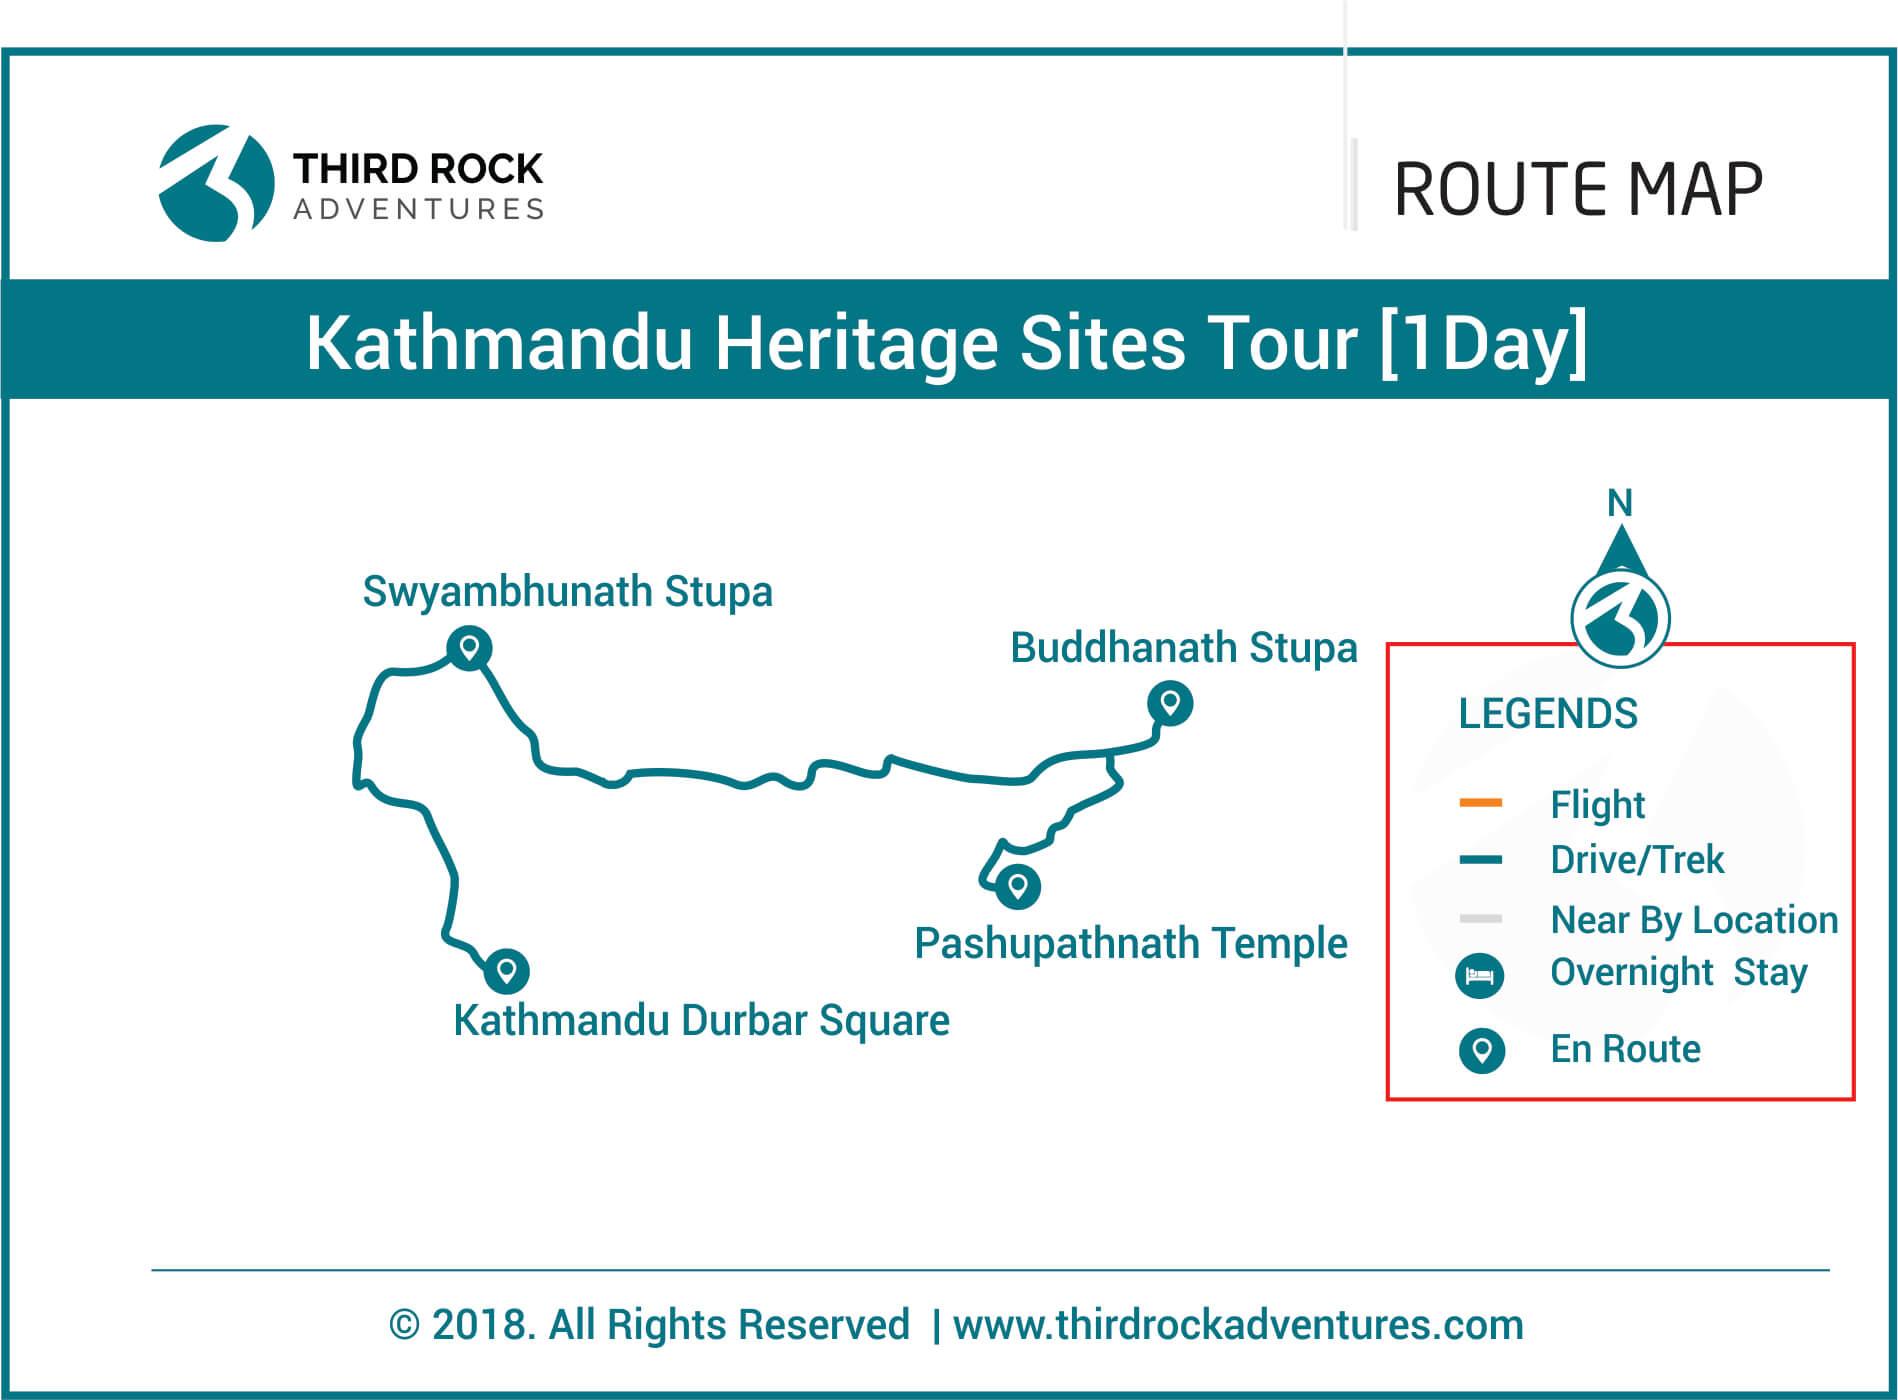 Kathmandu Heritage Tour 1 day Route Map